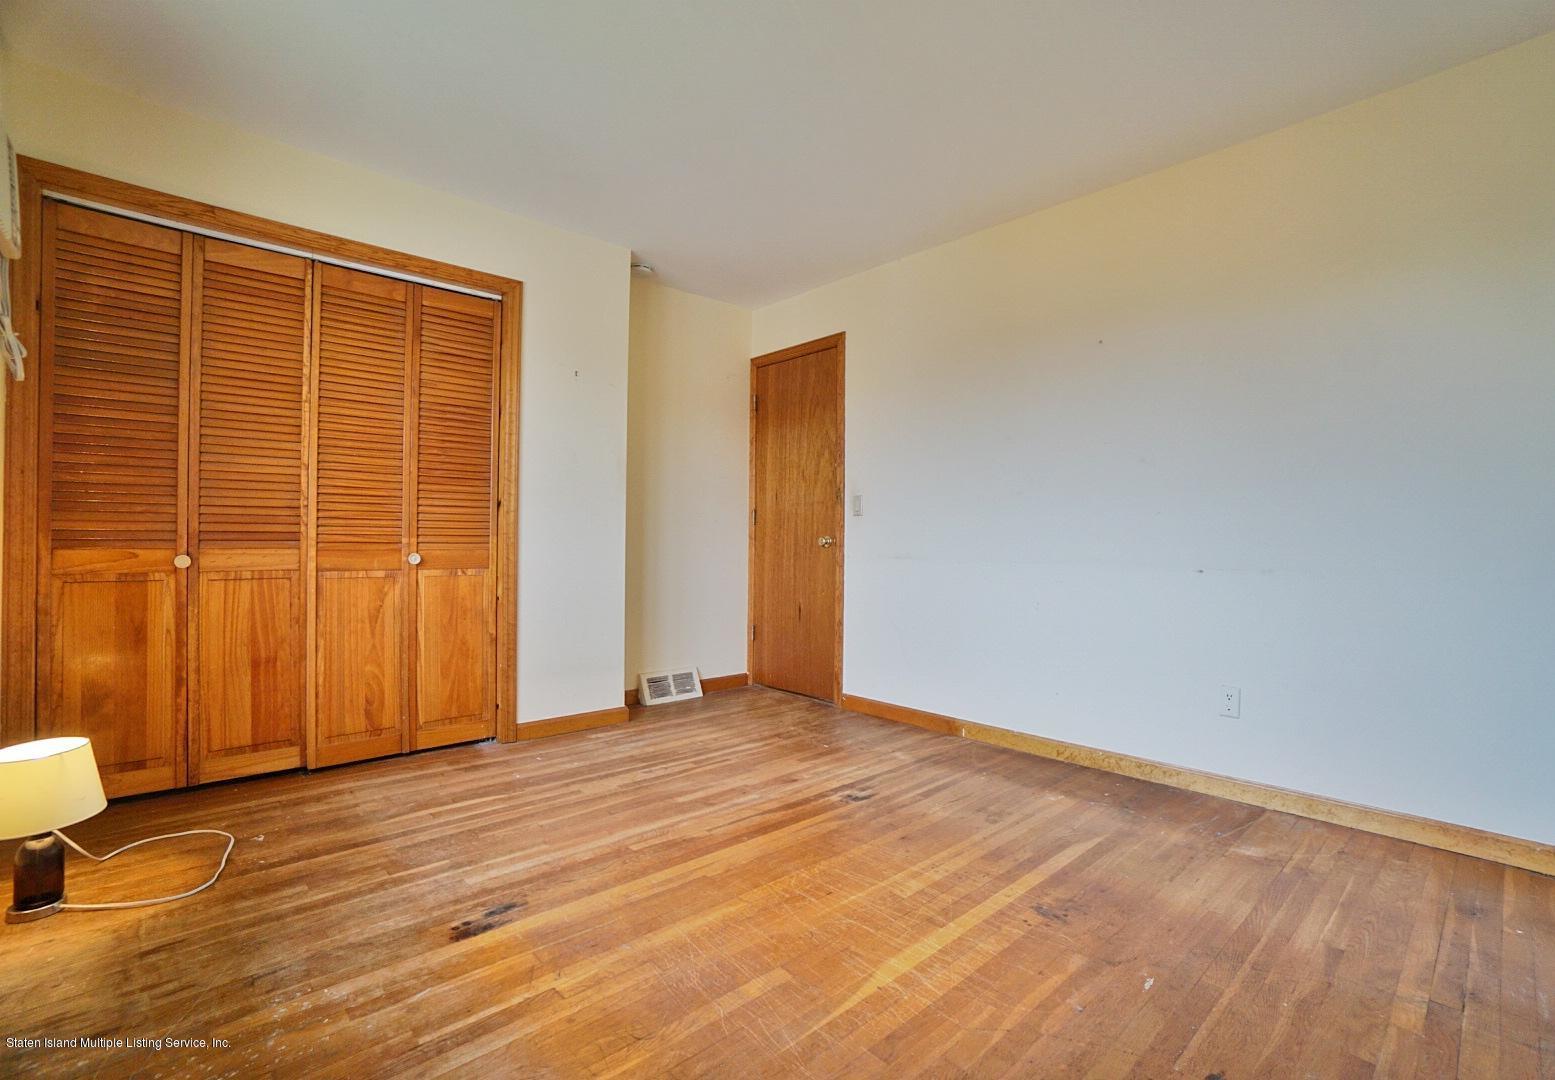 Single Family - Detached 55 Lyndale Avenue  Staten Island, NY 10312, MLS-1128769-15